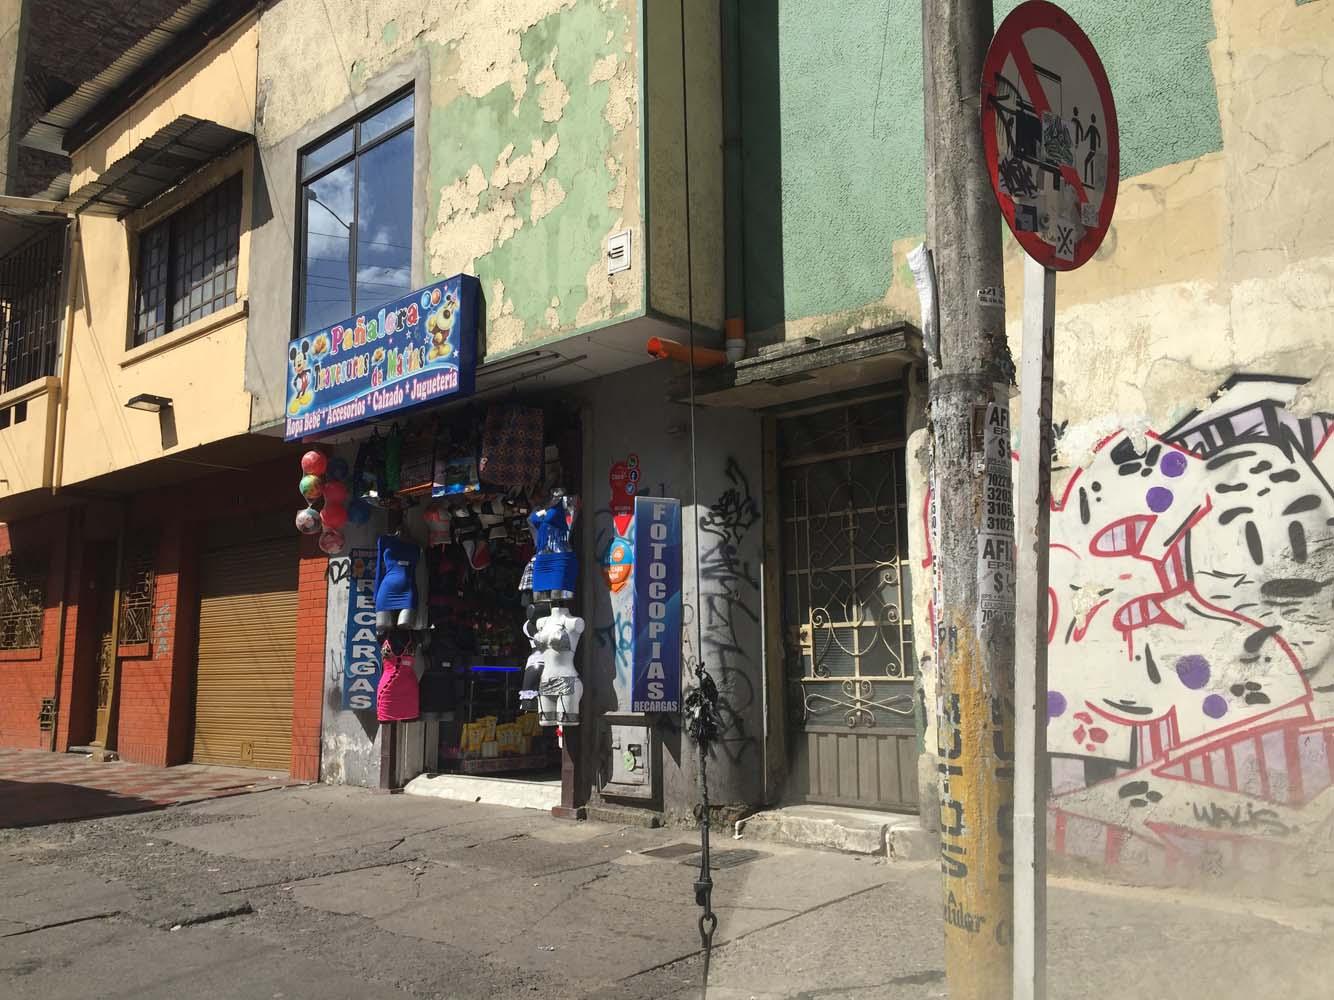 prostitutas en colombia prostituas